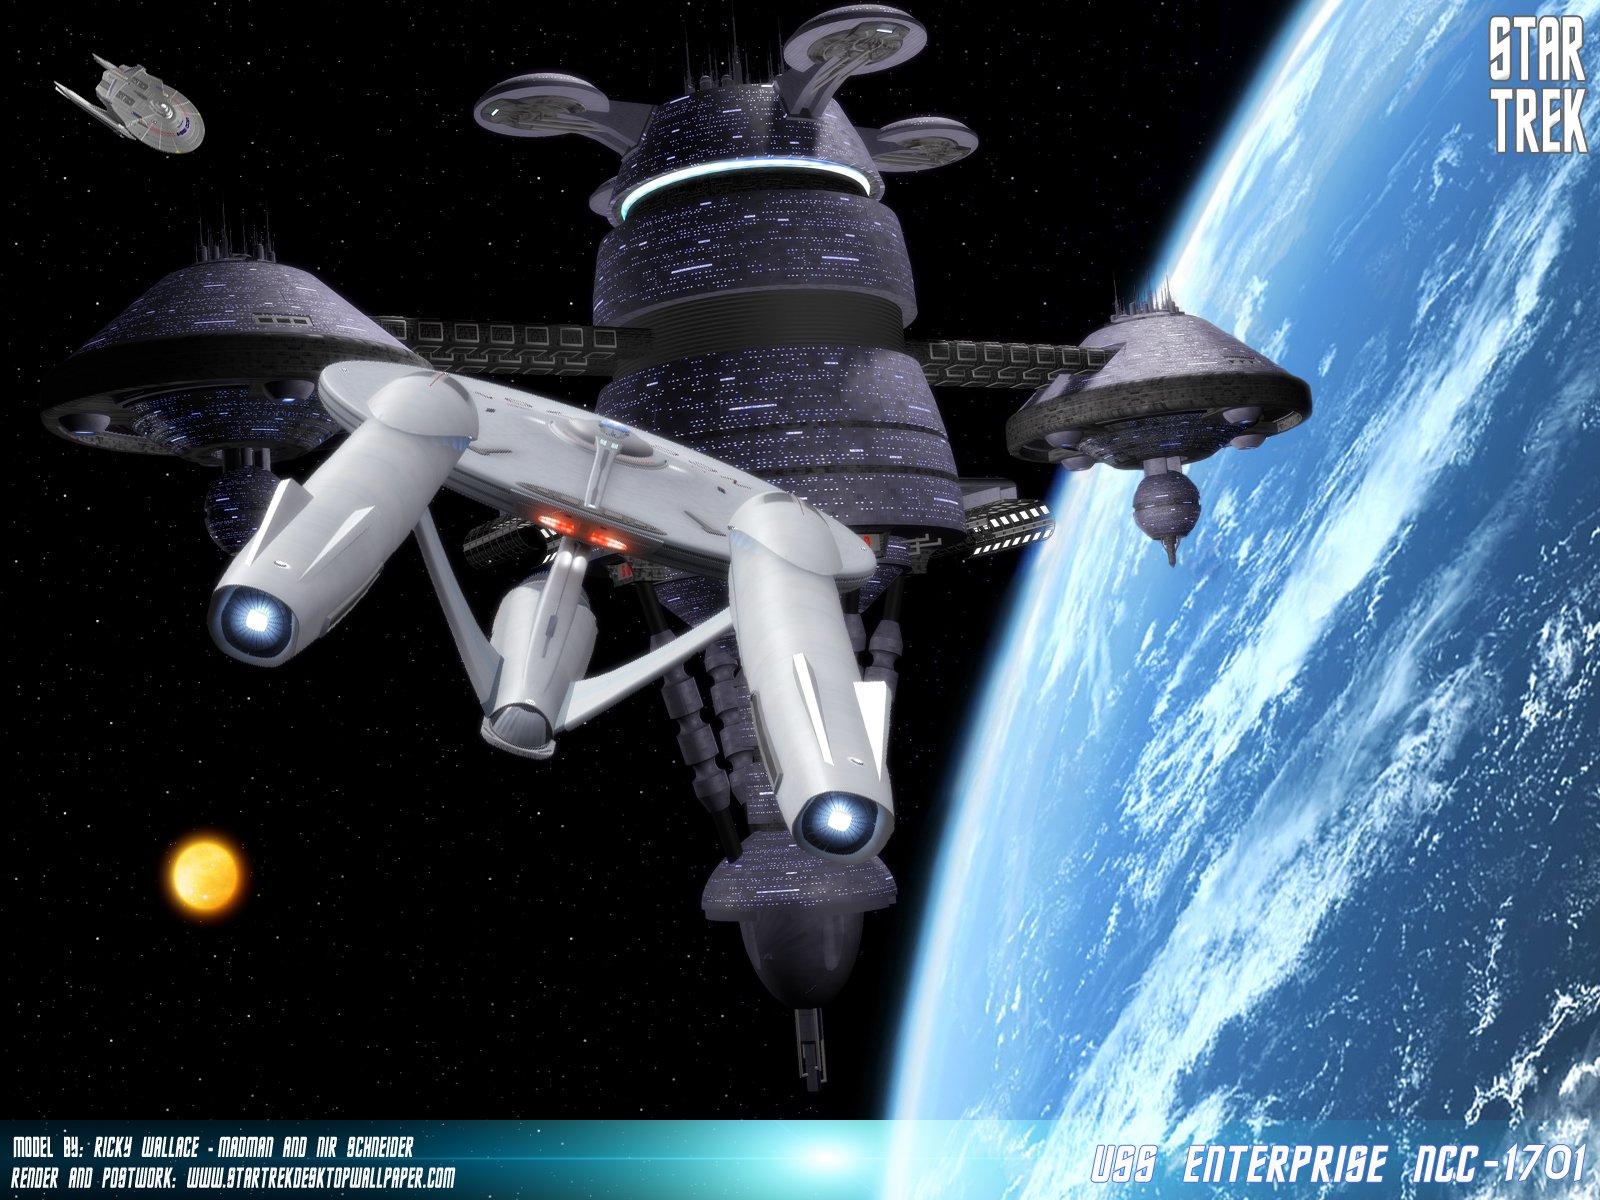 Star Trek Uss Enterprise Ncc1701 Freecomputerdesktopwallpaper 1600